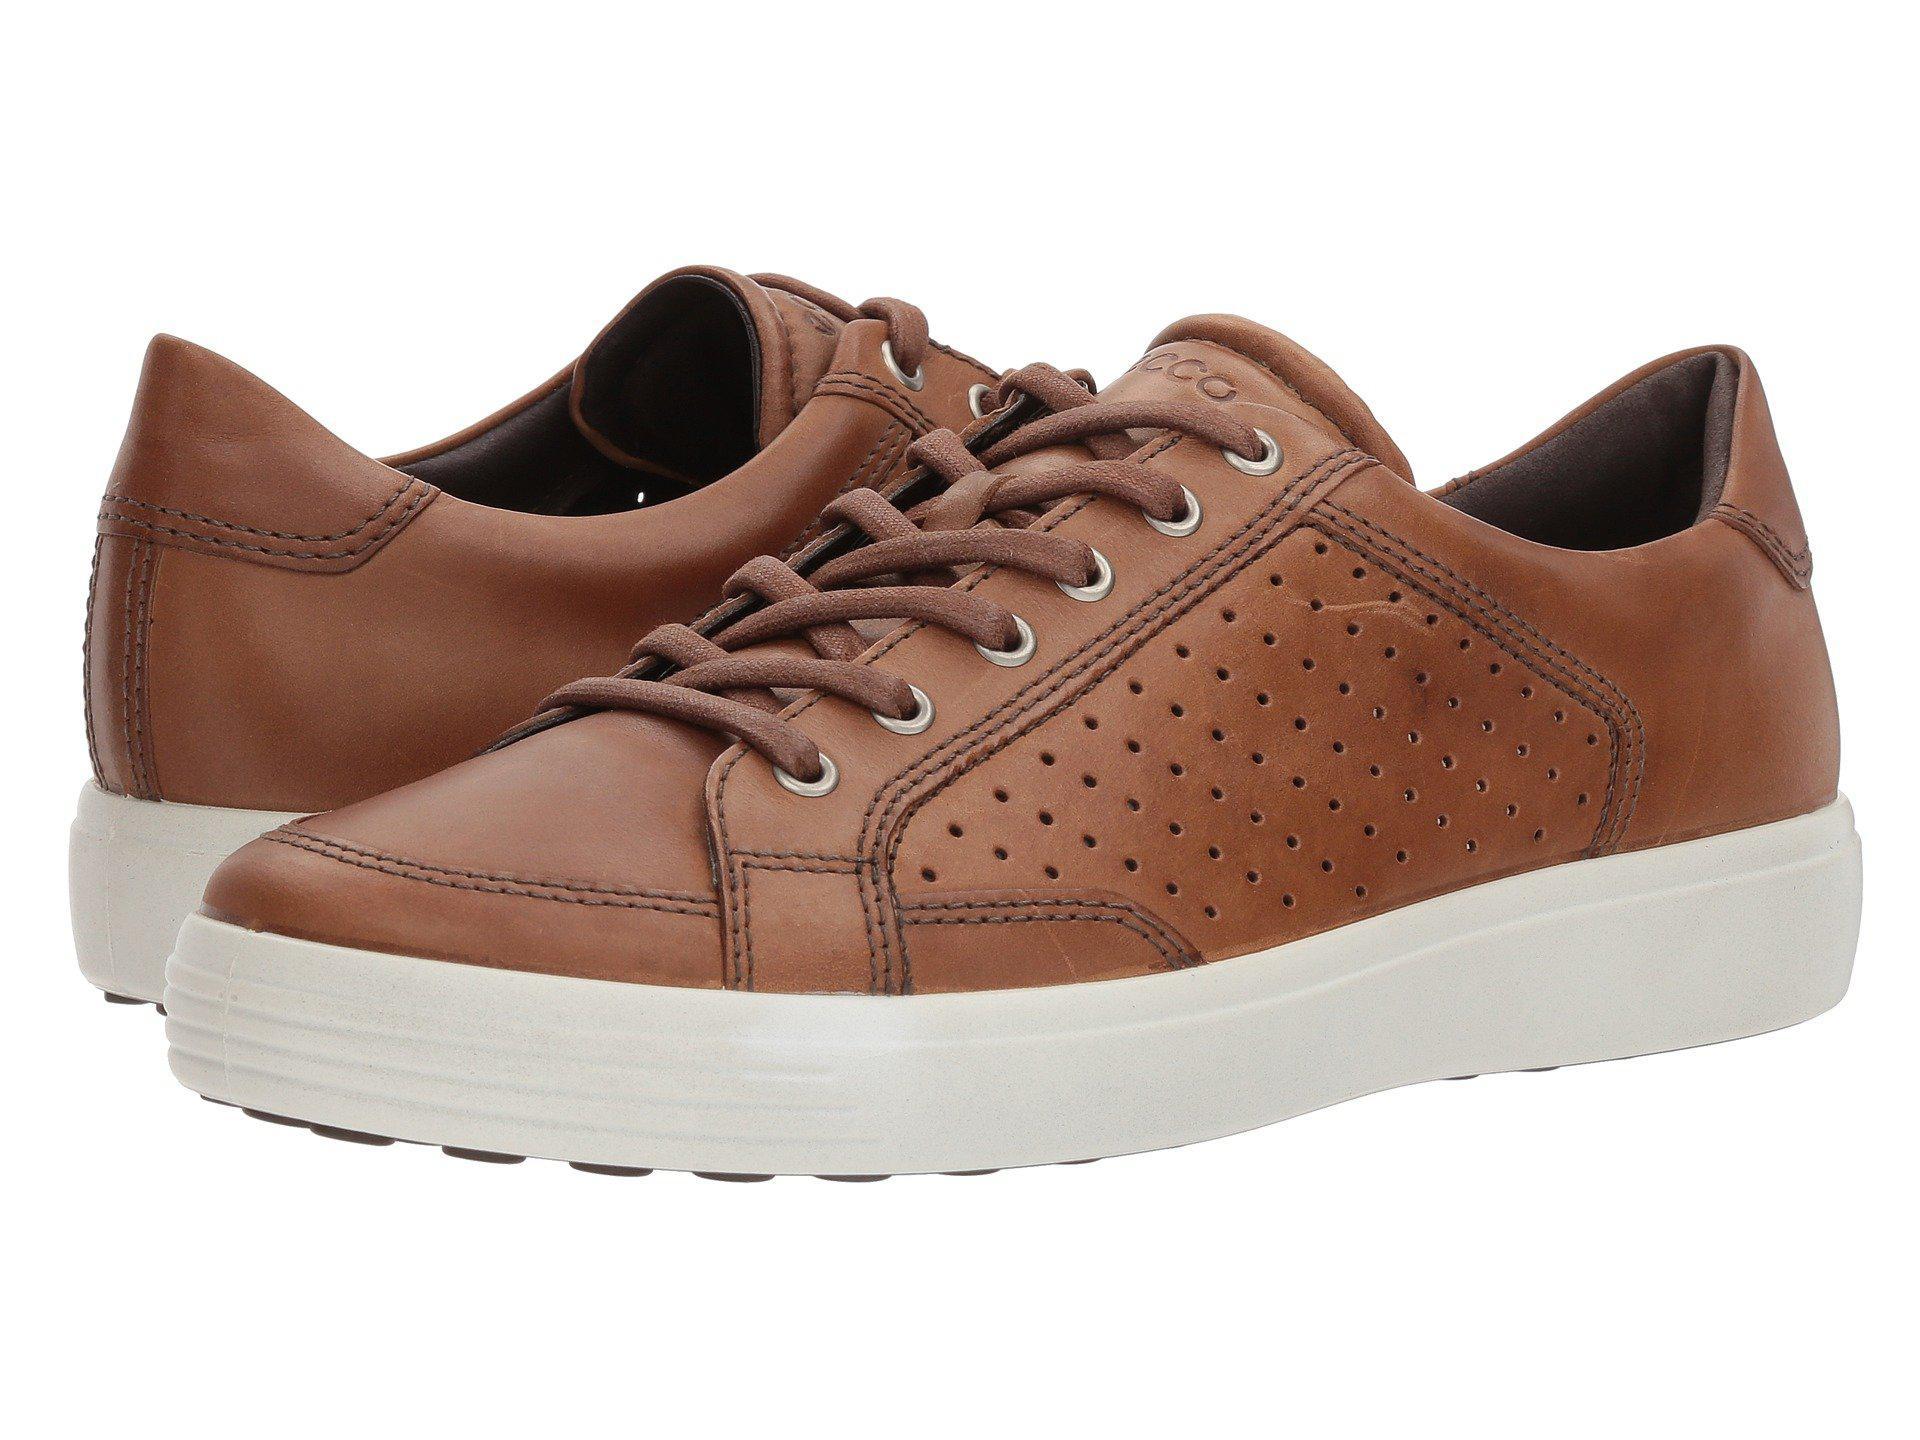 f2bbfa9a83e9 Lyst - Ecco Soft 7 Retro Tie (whiskey) Men s Lace Up Casual Shoes in ...